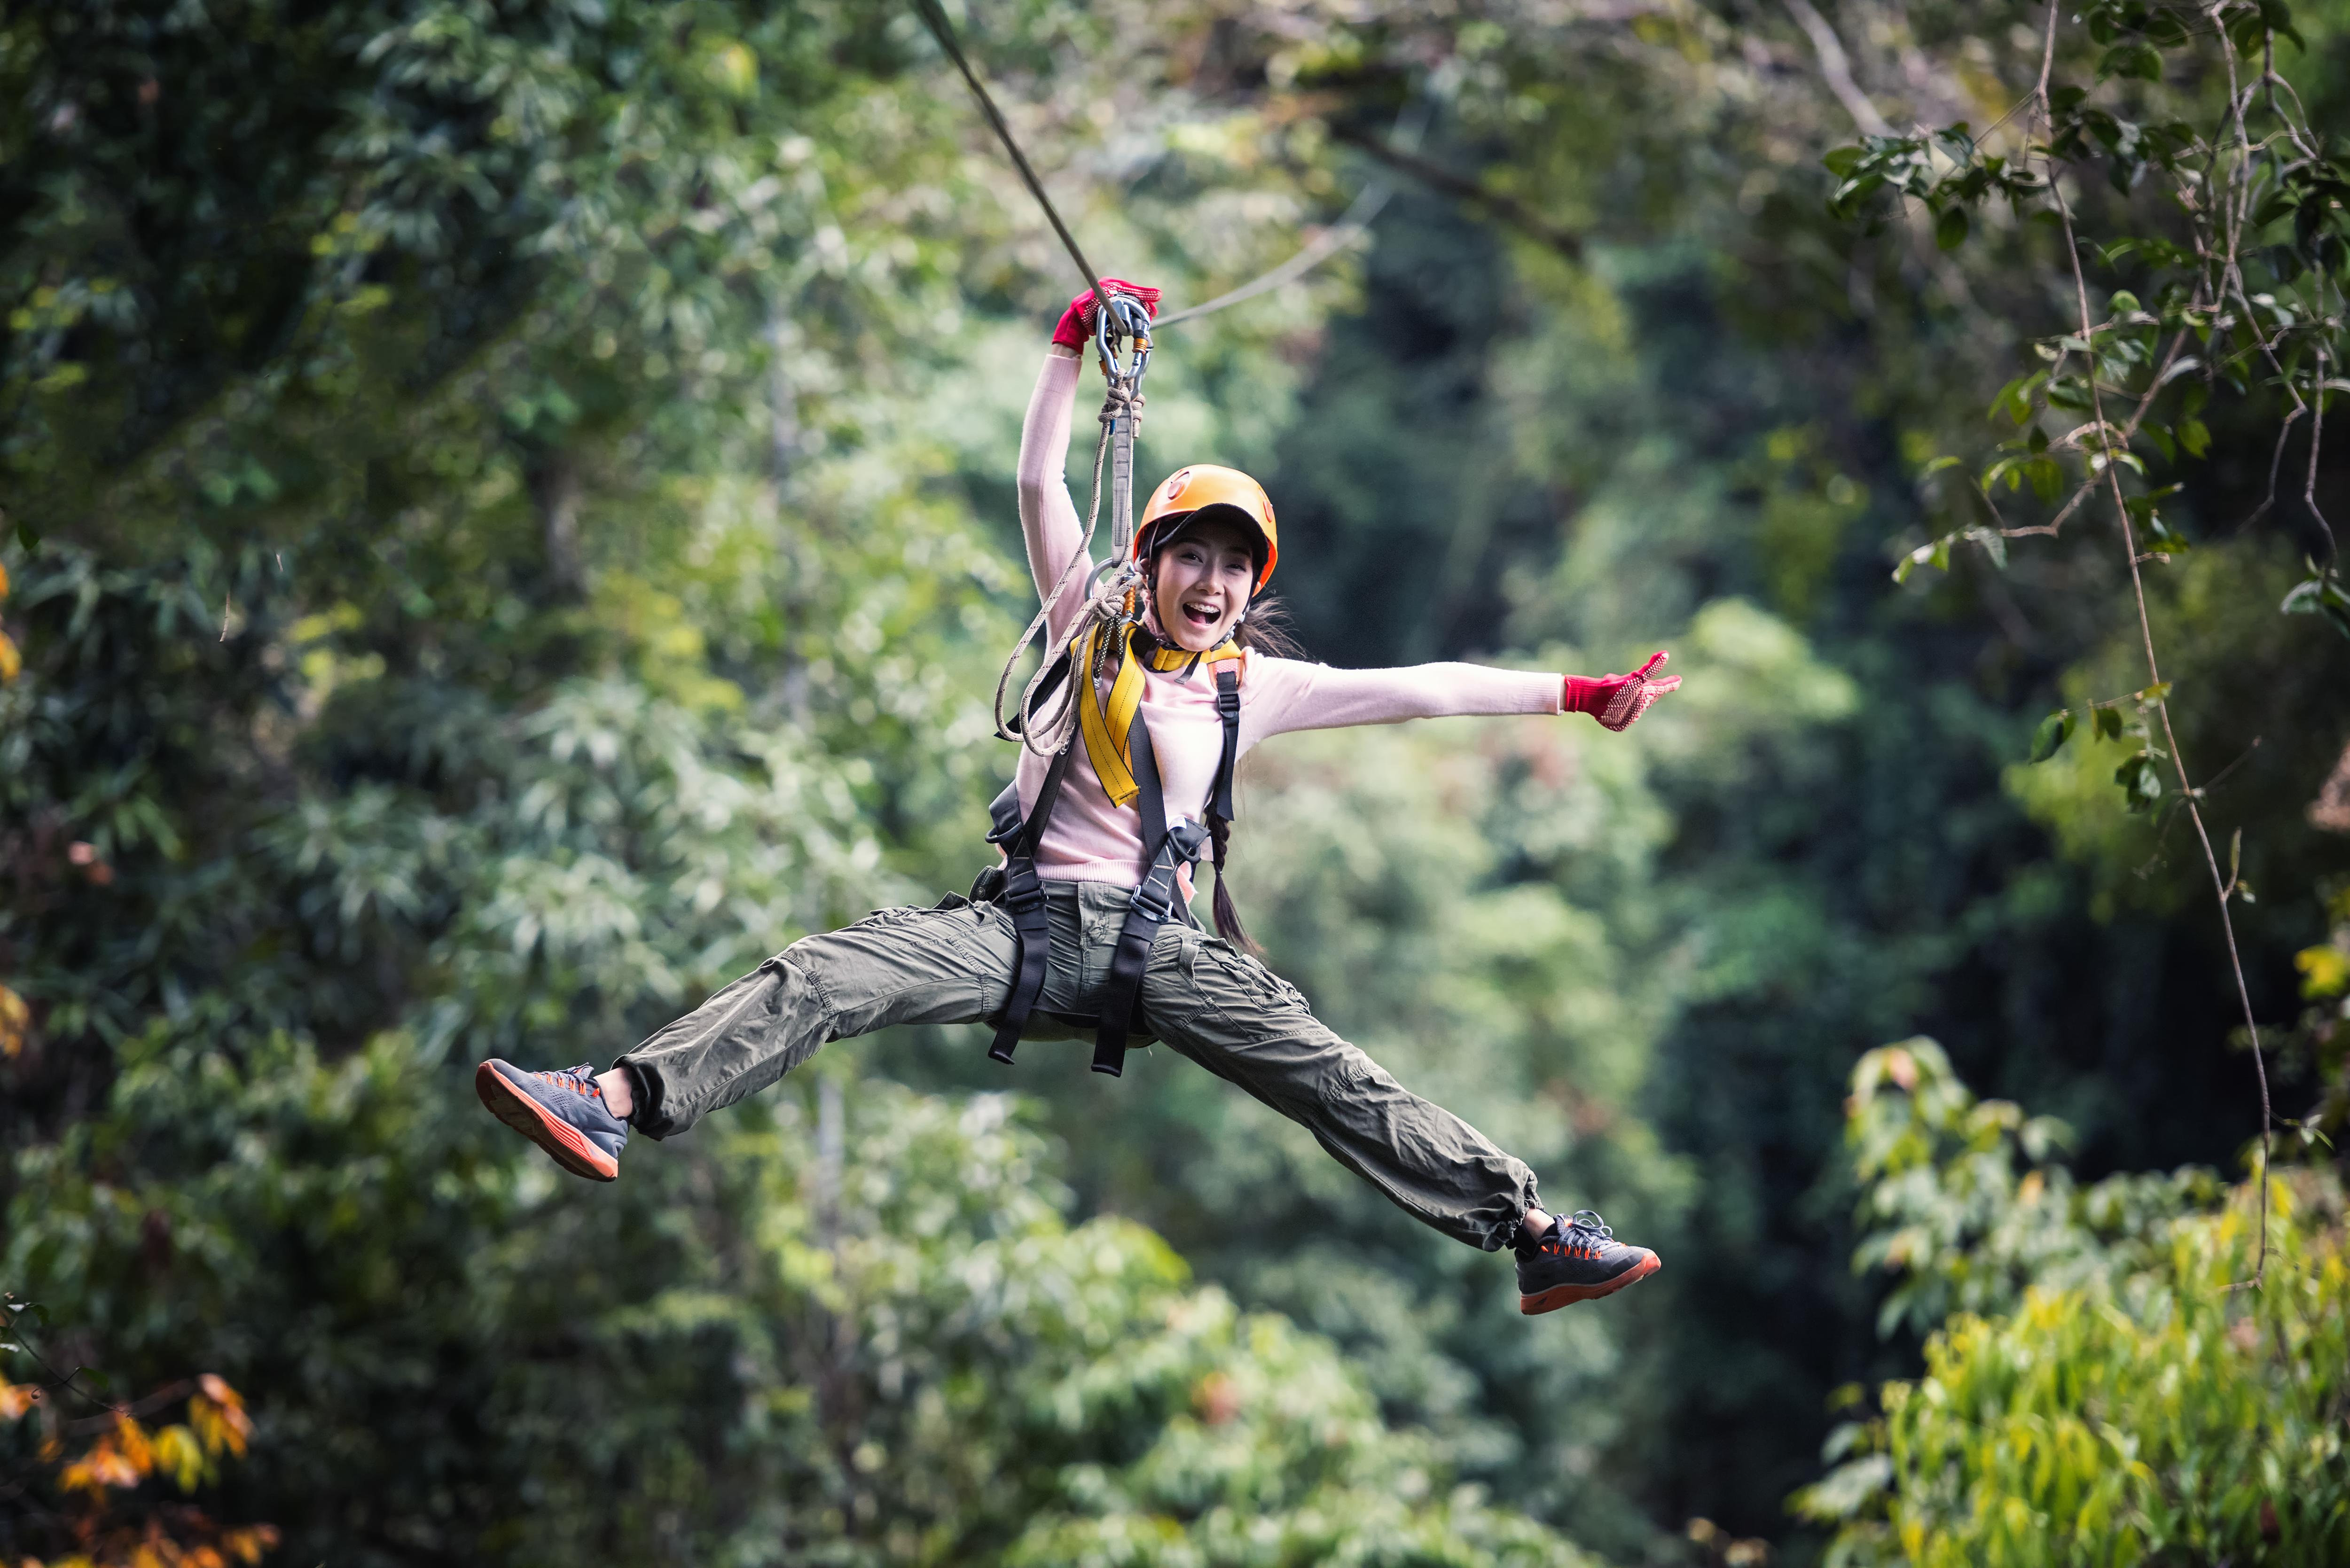 World Travel Awards 2019 Latinoamérica para el canopy en Chile